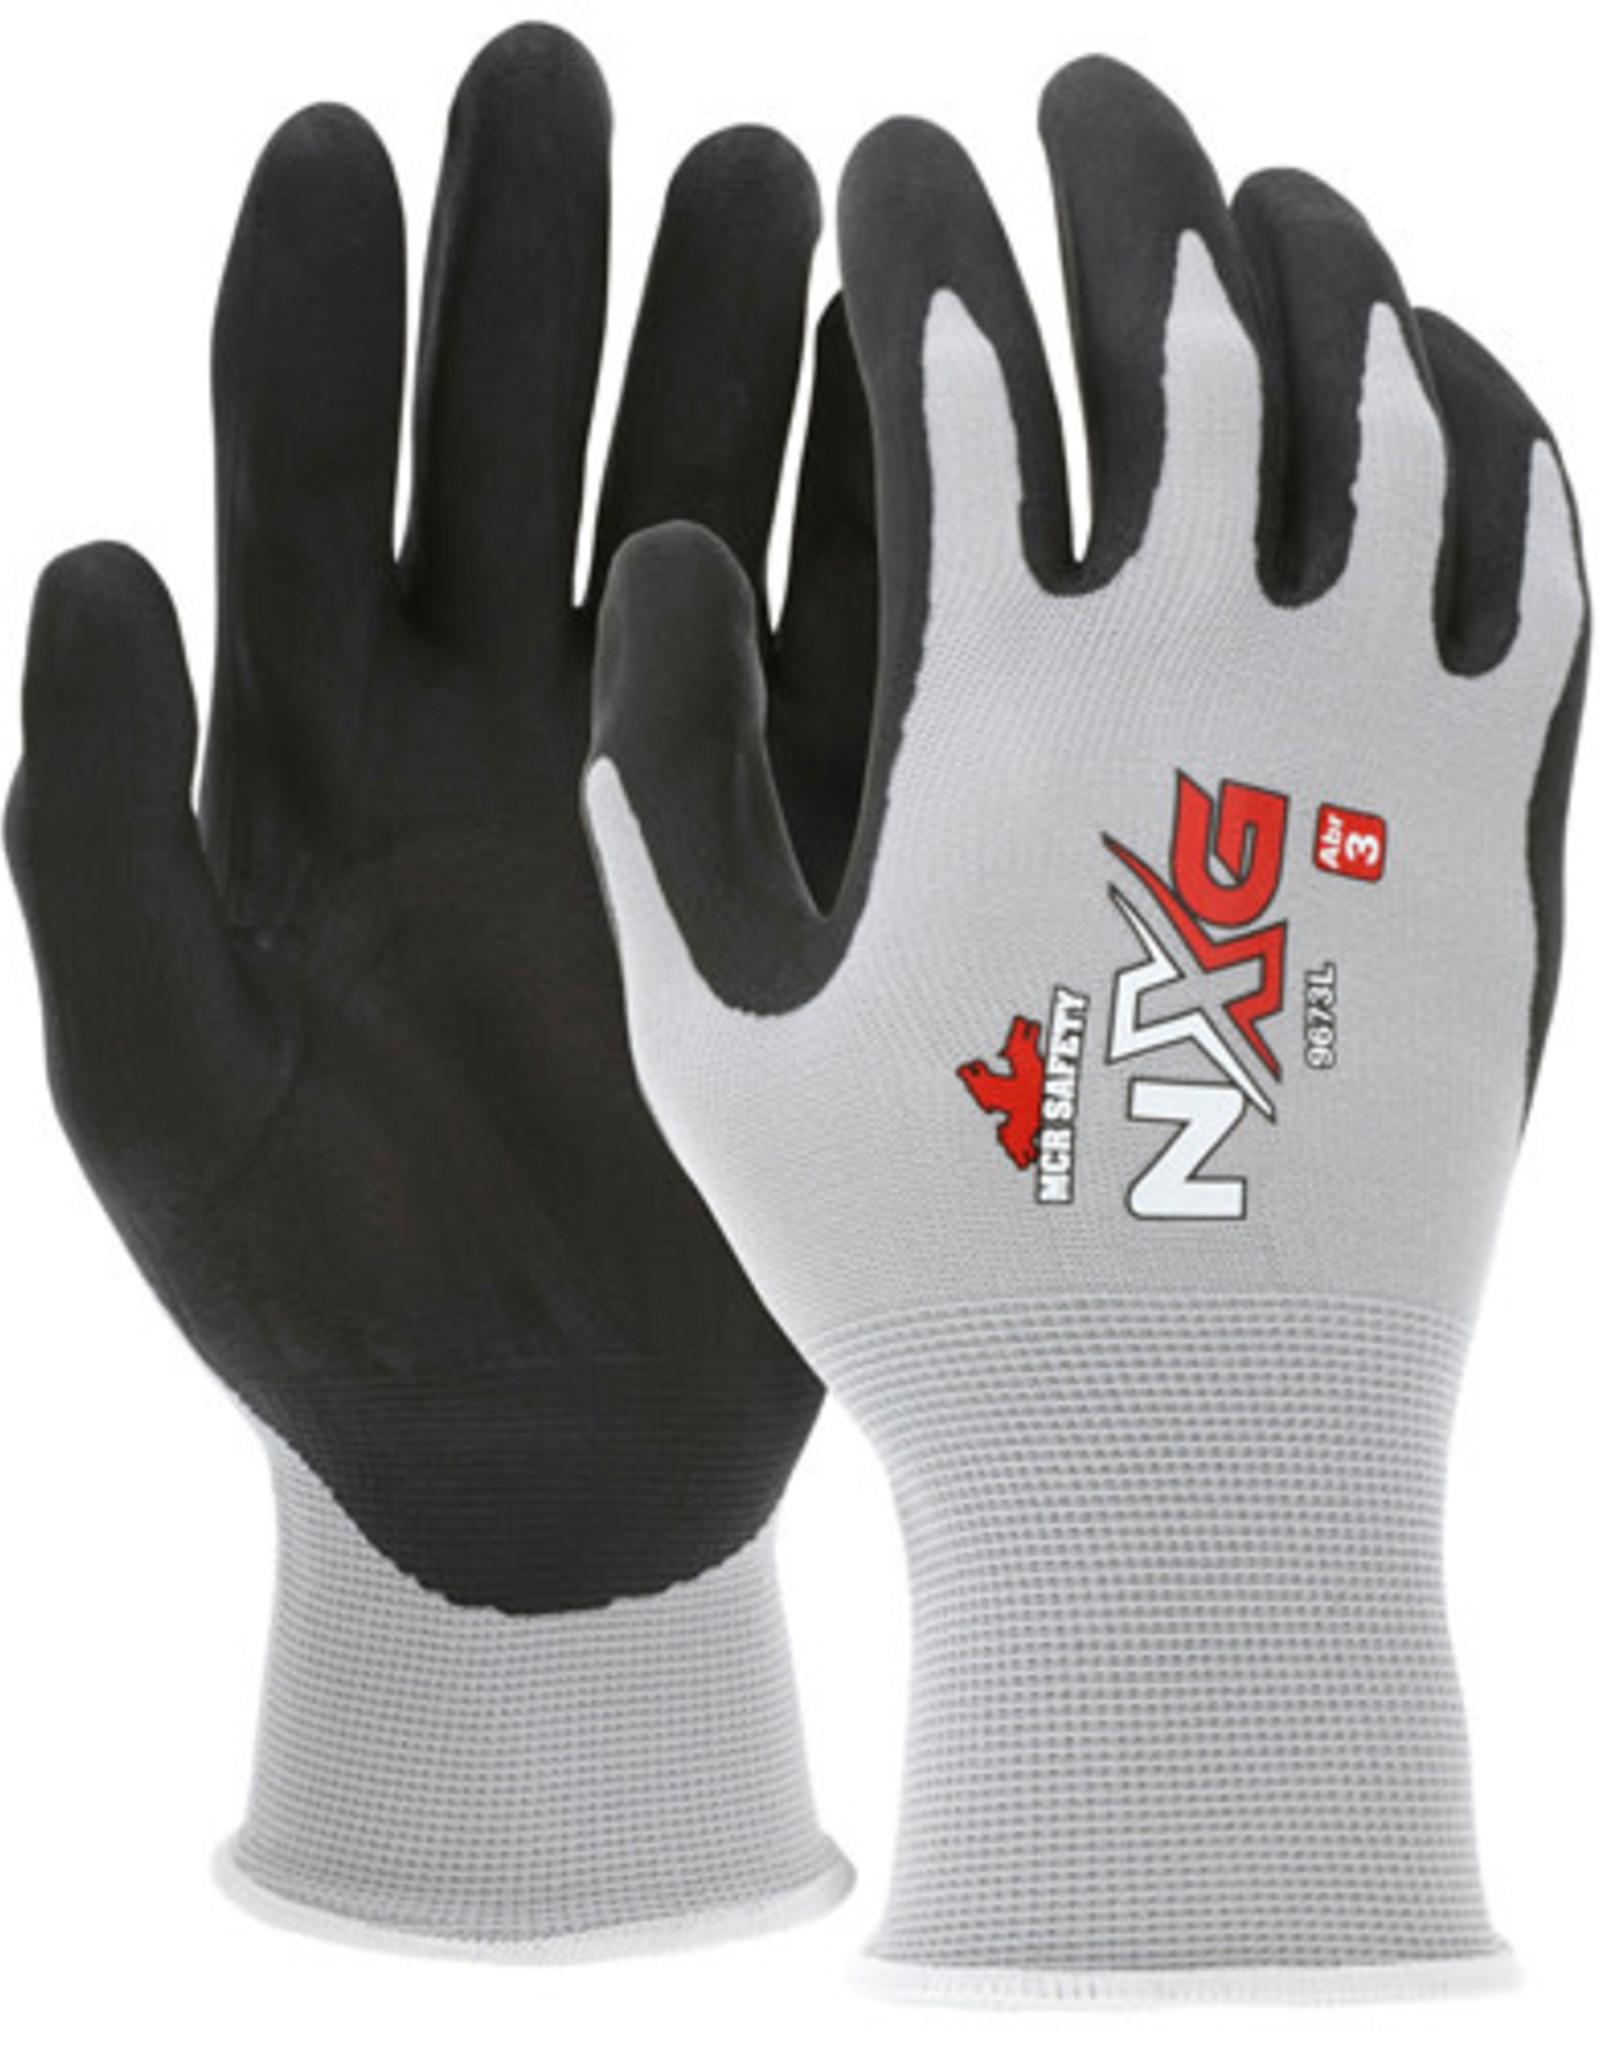 Wolverine Nylon shell & nitrile dipped glove